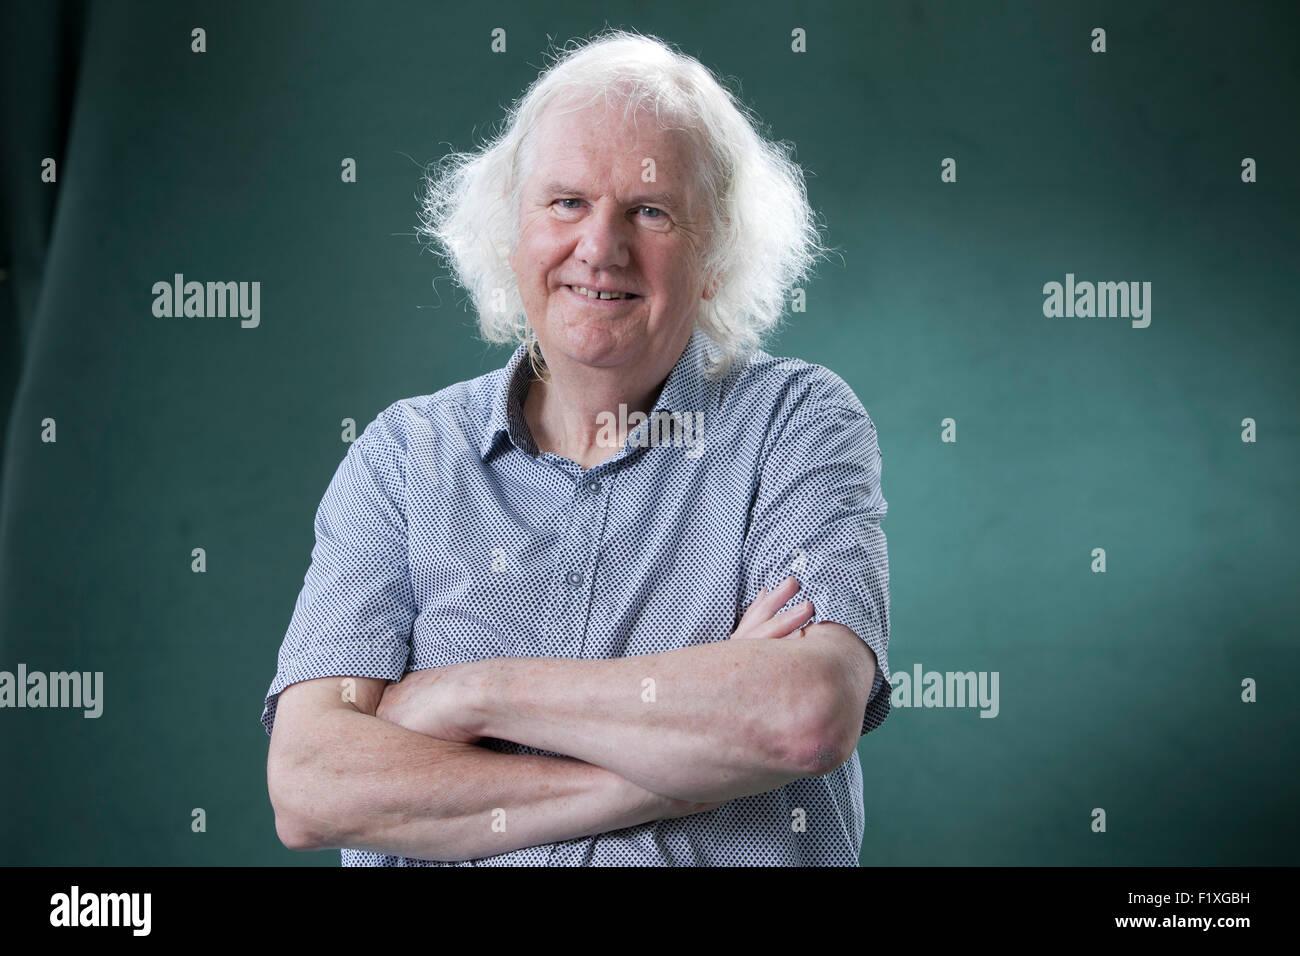 Ron Butlin, the Scottish poet and novelist, at the Edinburgh International Book Festival 2015. Edinburgh, Scotland. - Stock Image